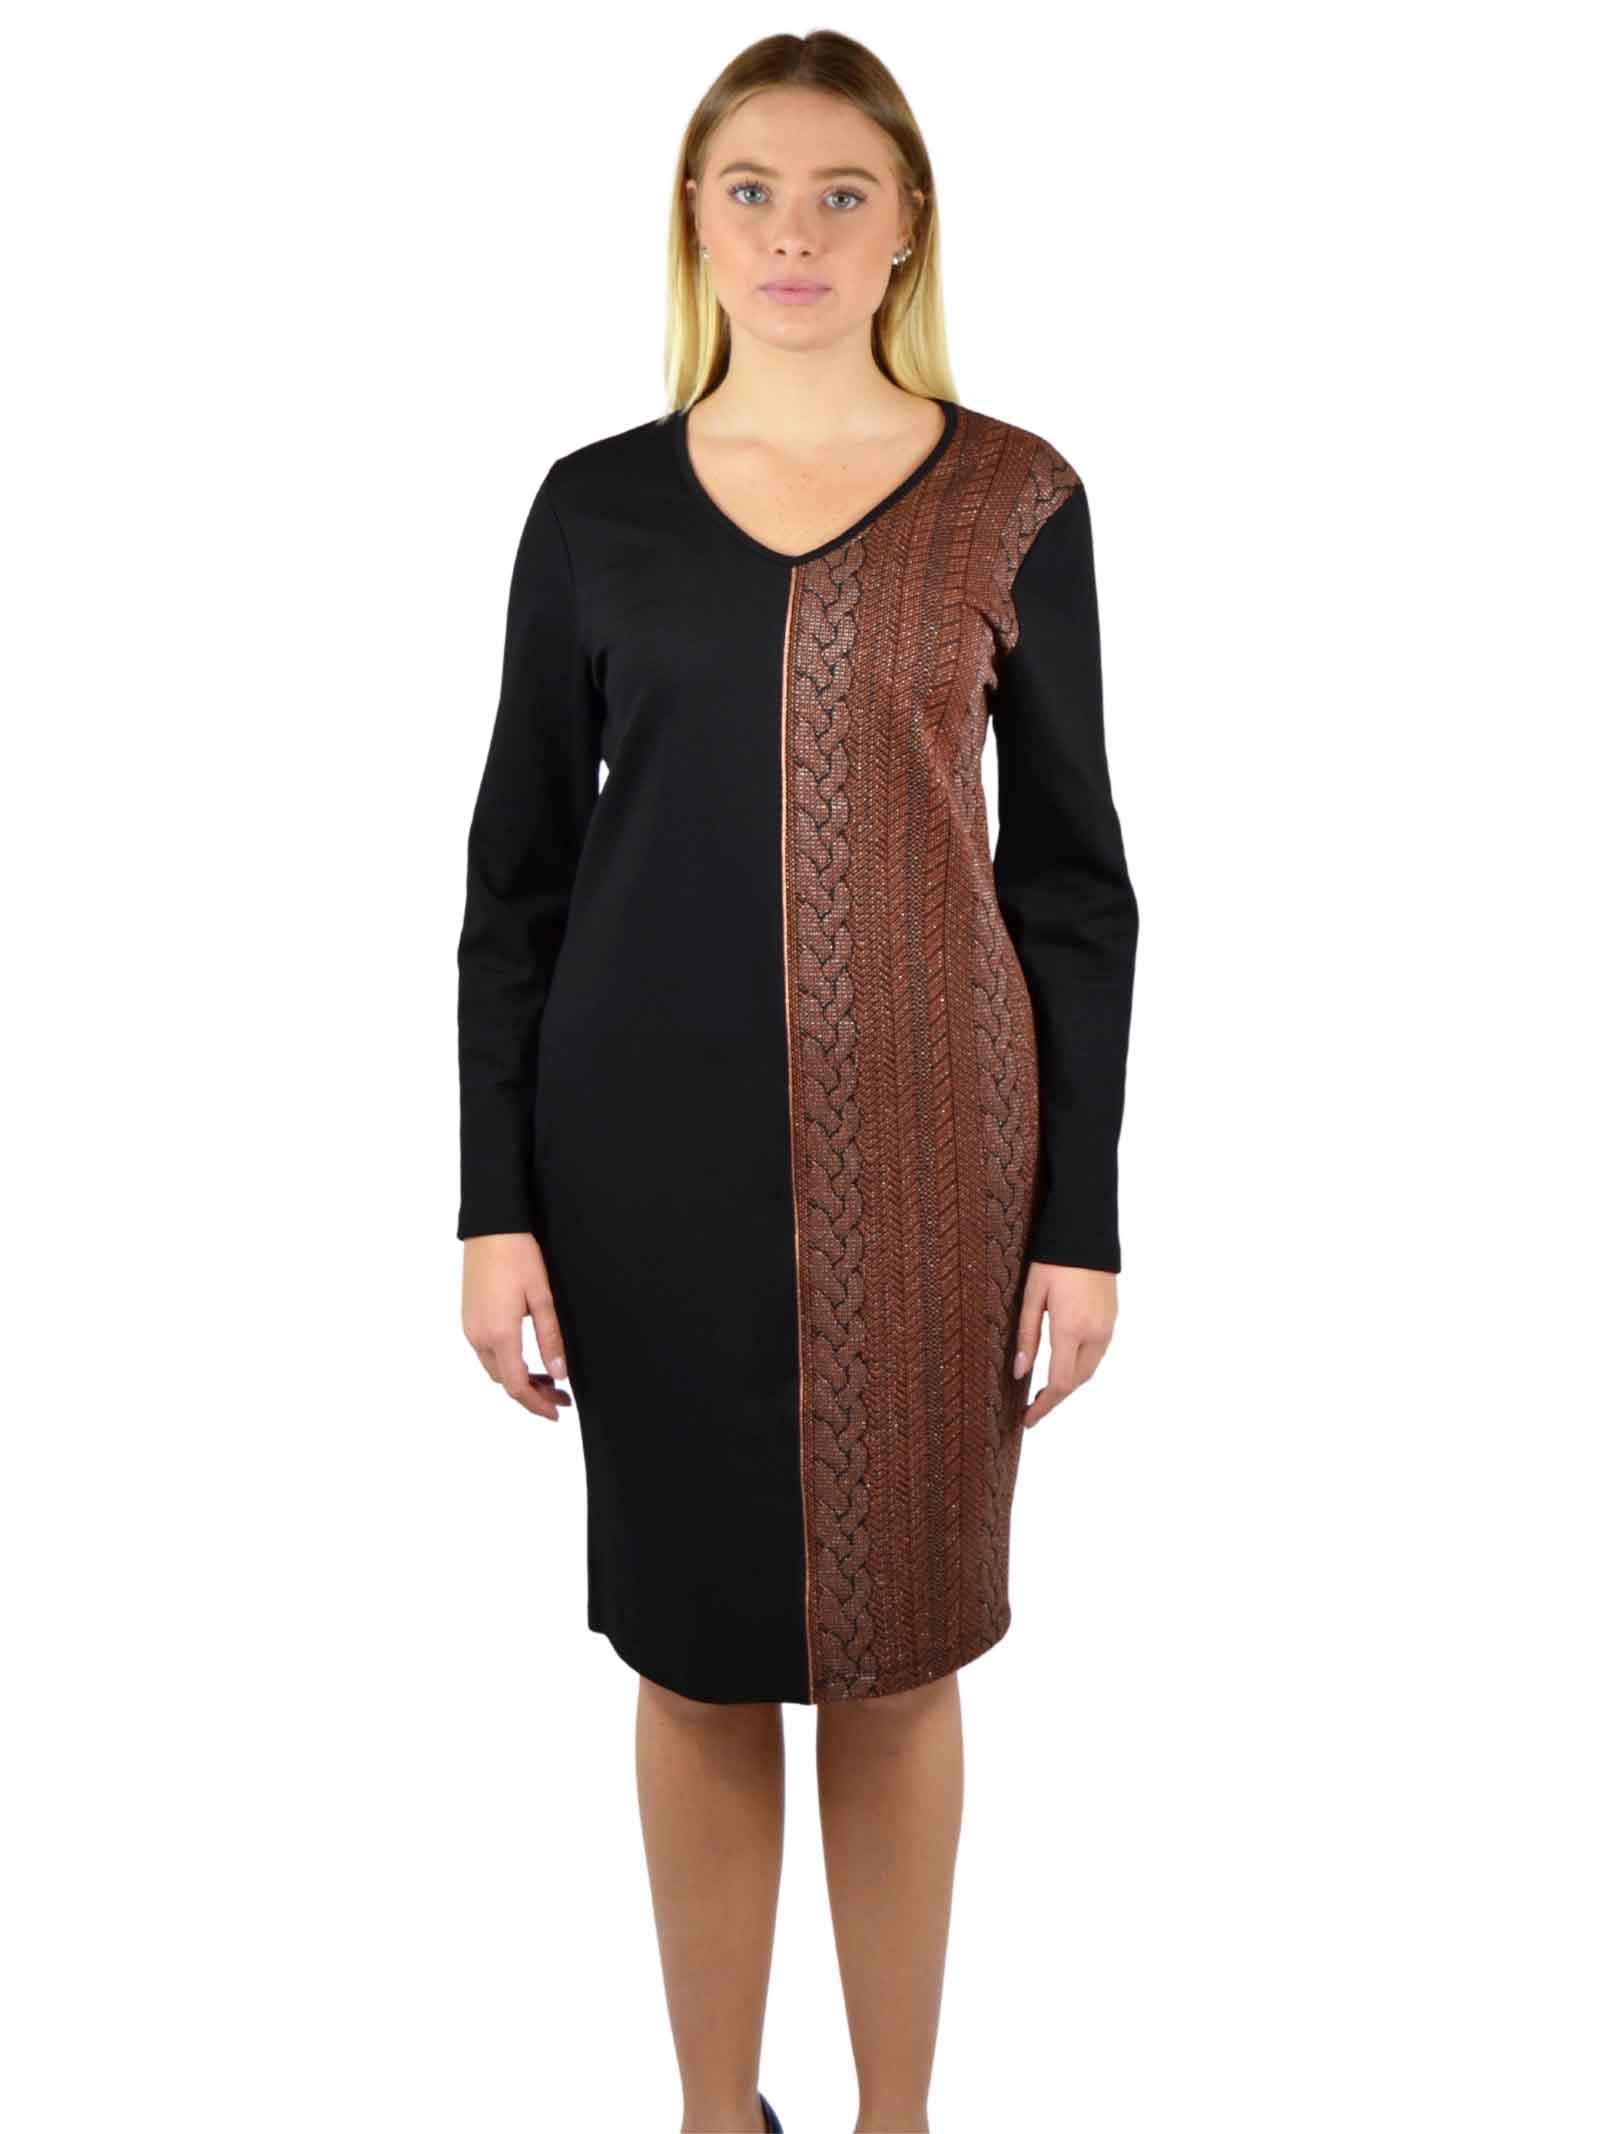 Sheat Dress long sleeves V neck MEALYS |  | CY-A32402